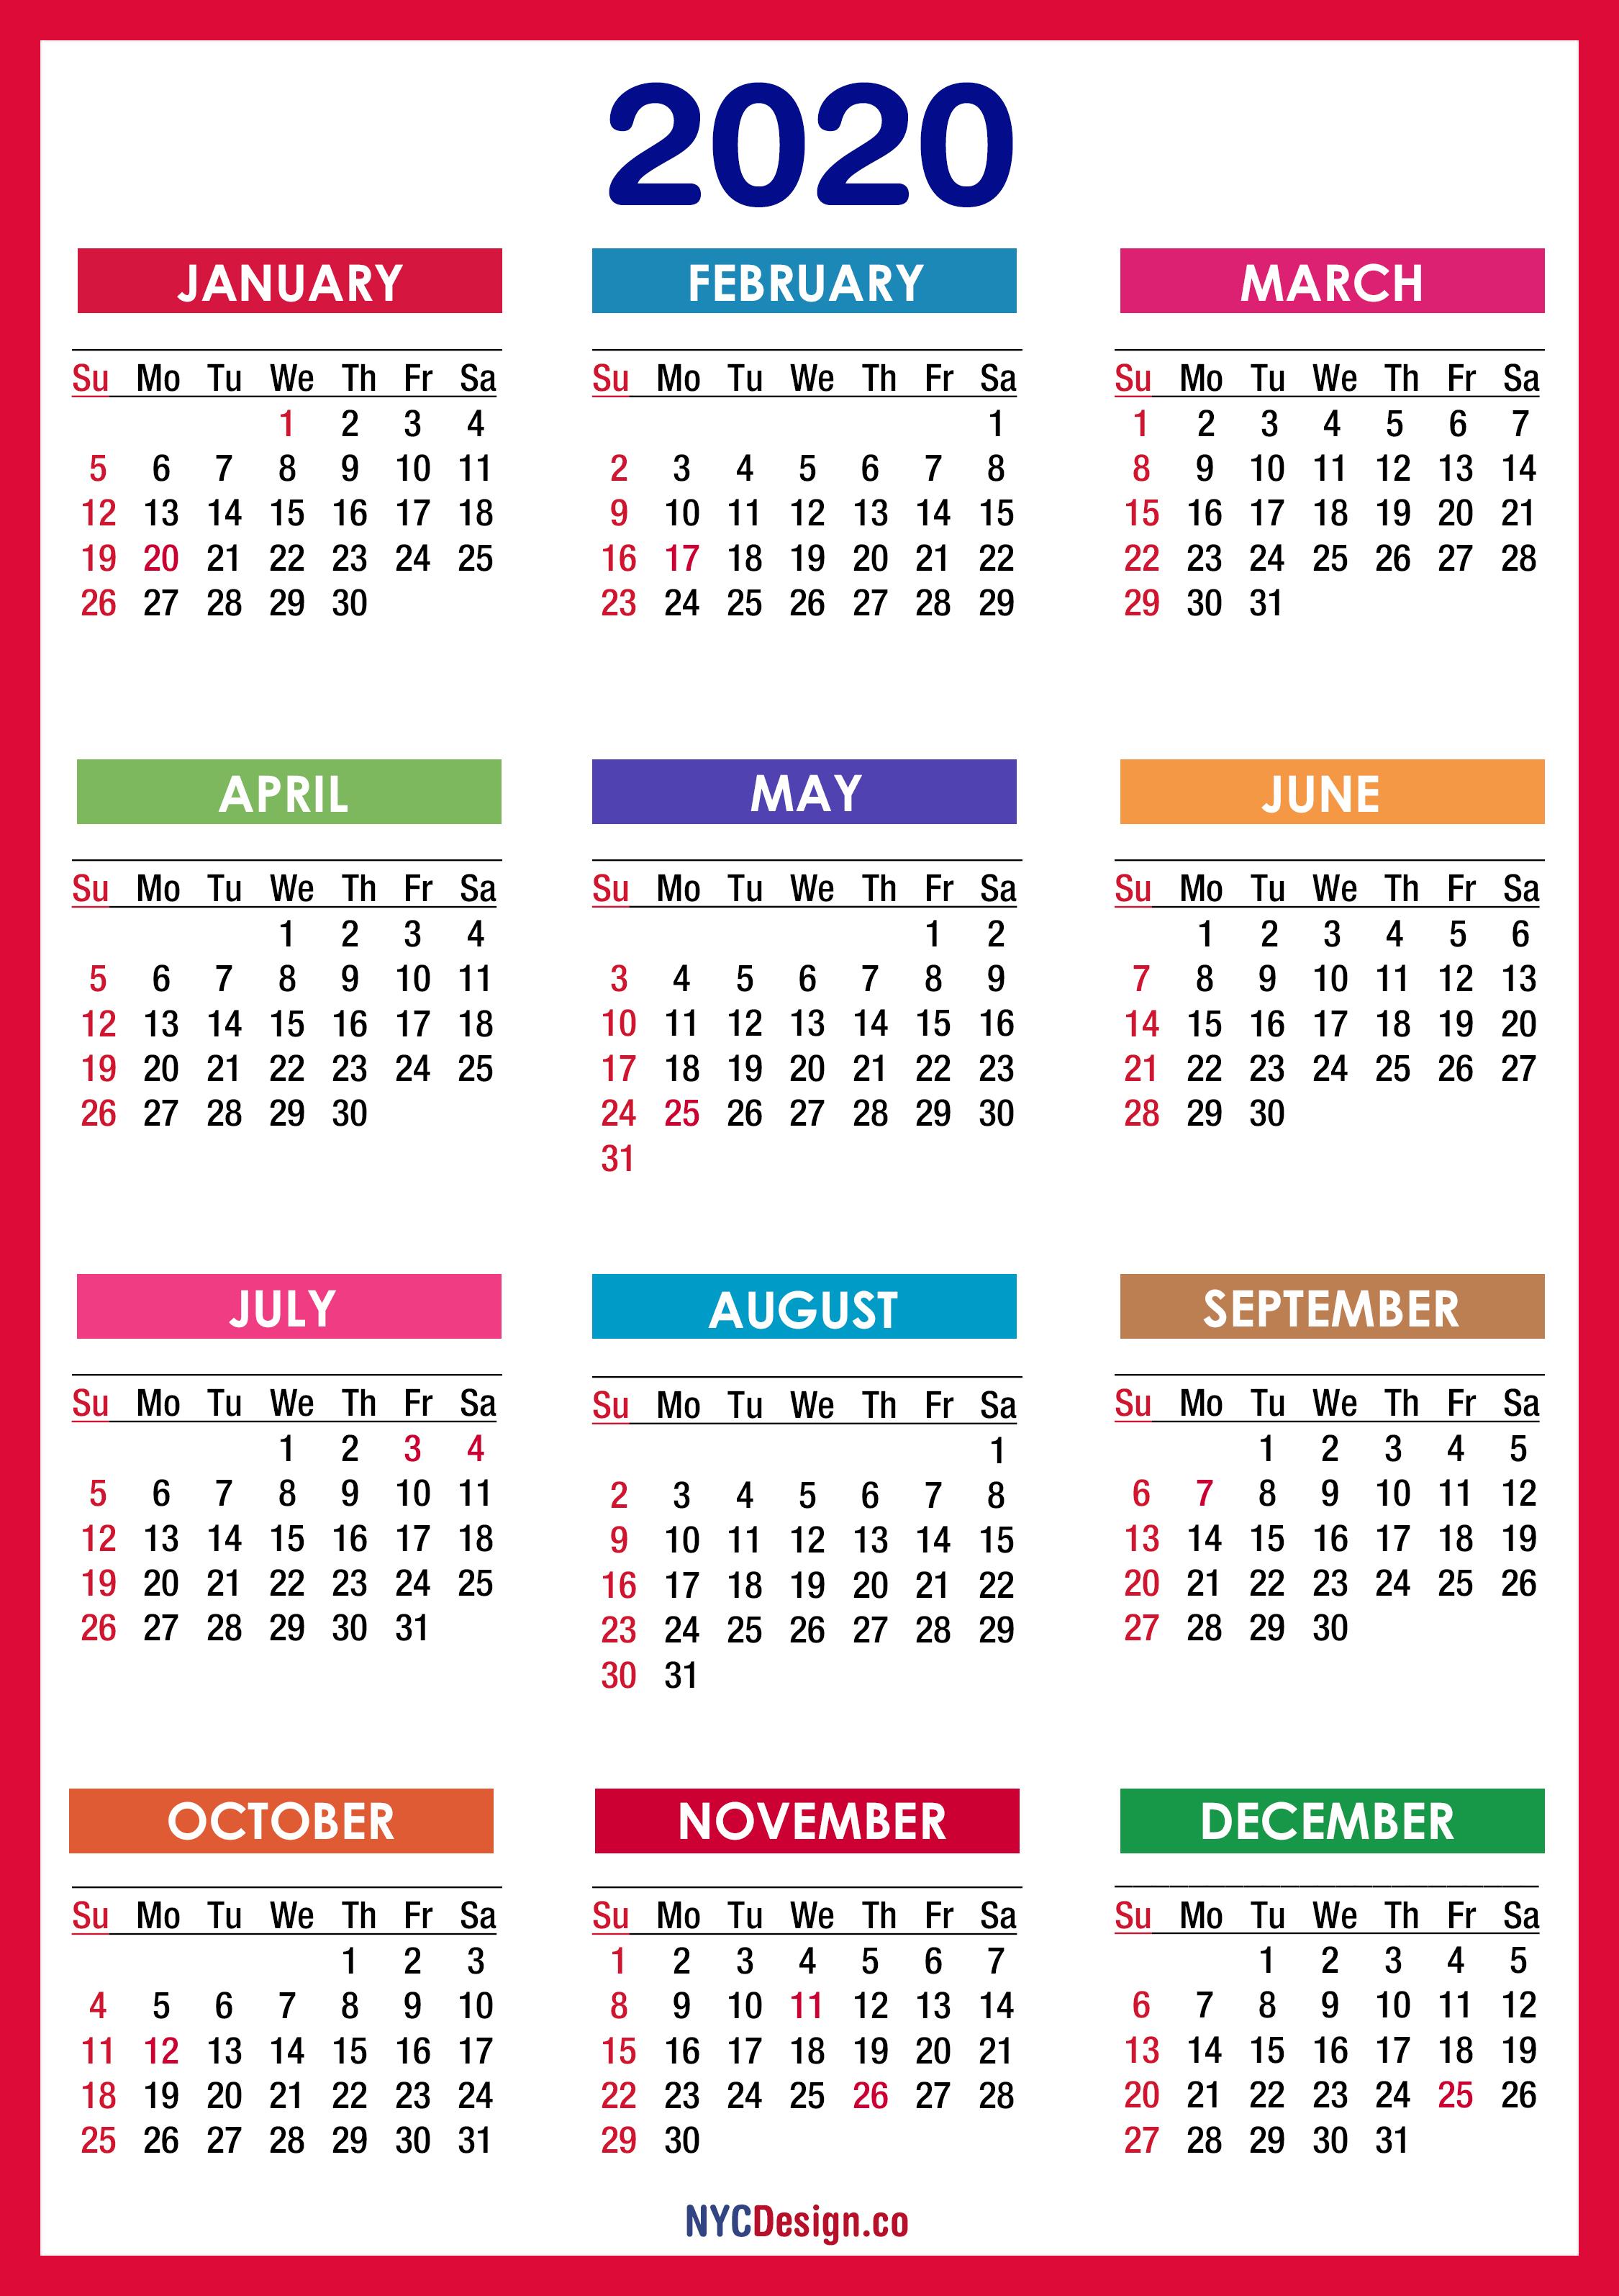 2020 Calendar With Holidays, Printable Free, Pdf, Colorful within 2020 Calendar With Holidays Printable Free